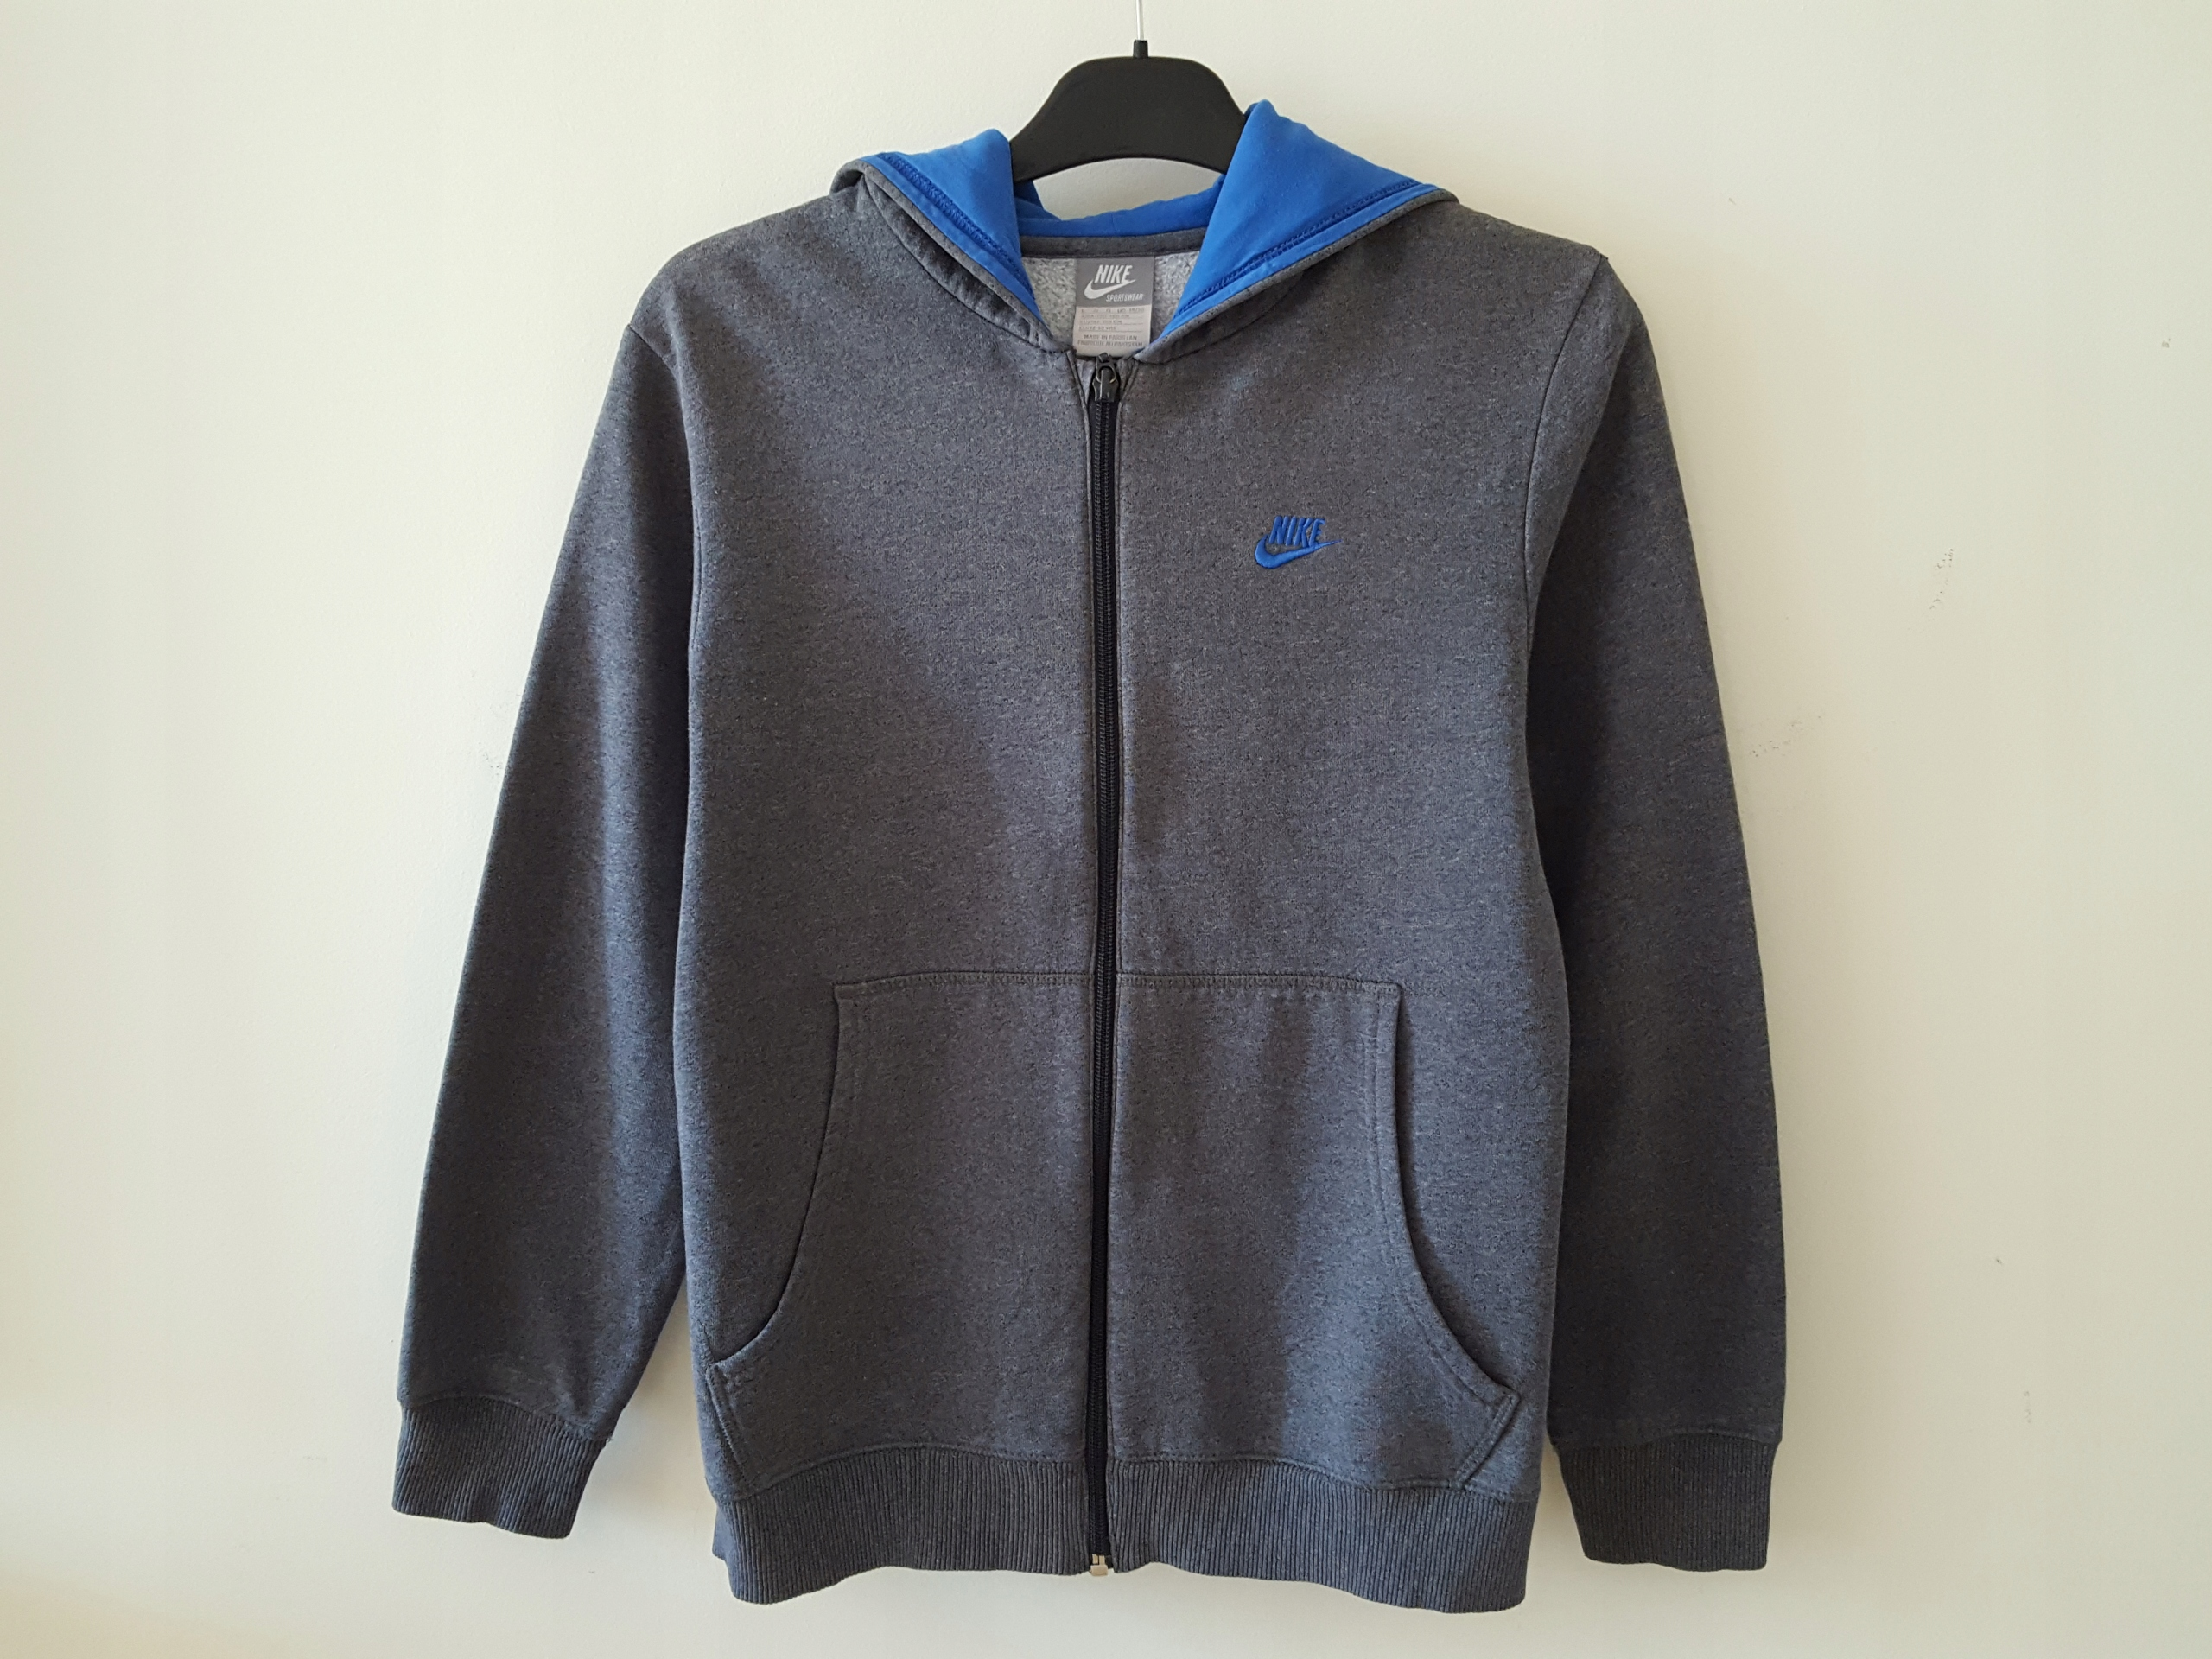 Bluza szara Nike r. 12-13 lat (152-158 cm)